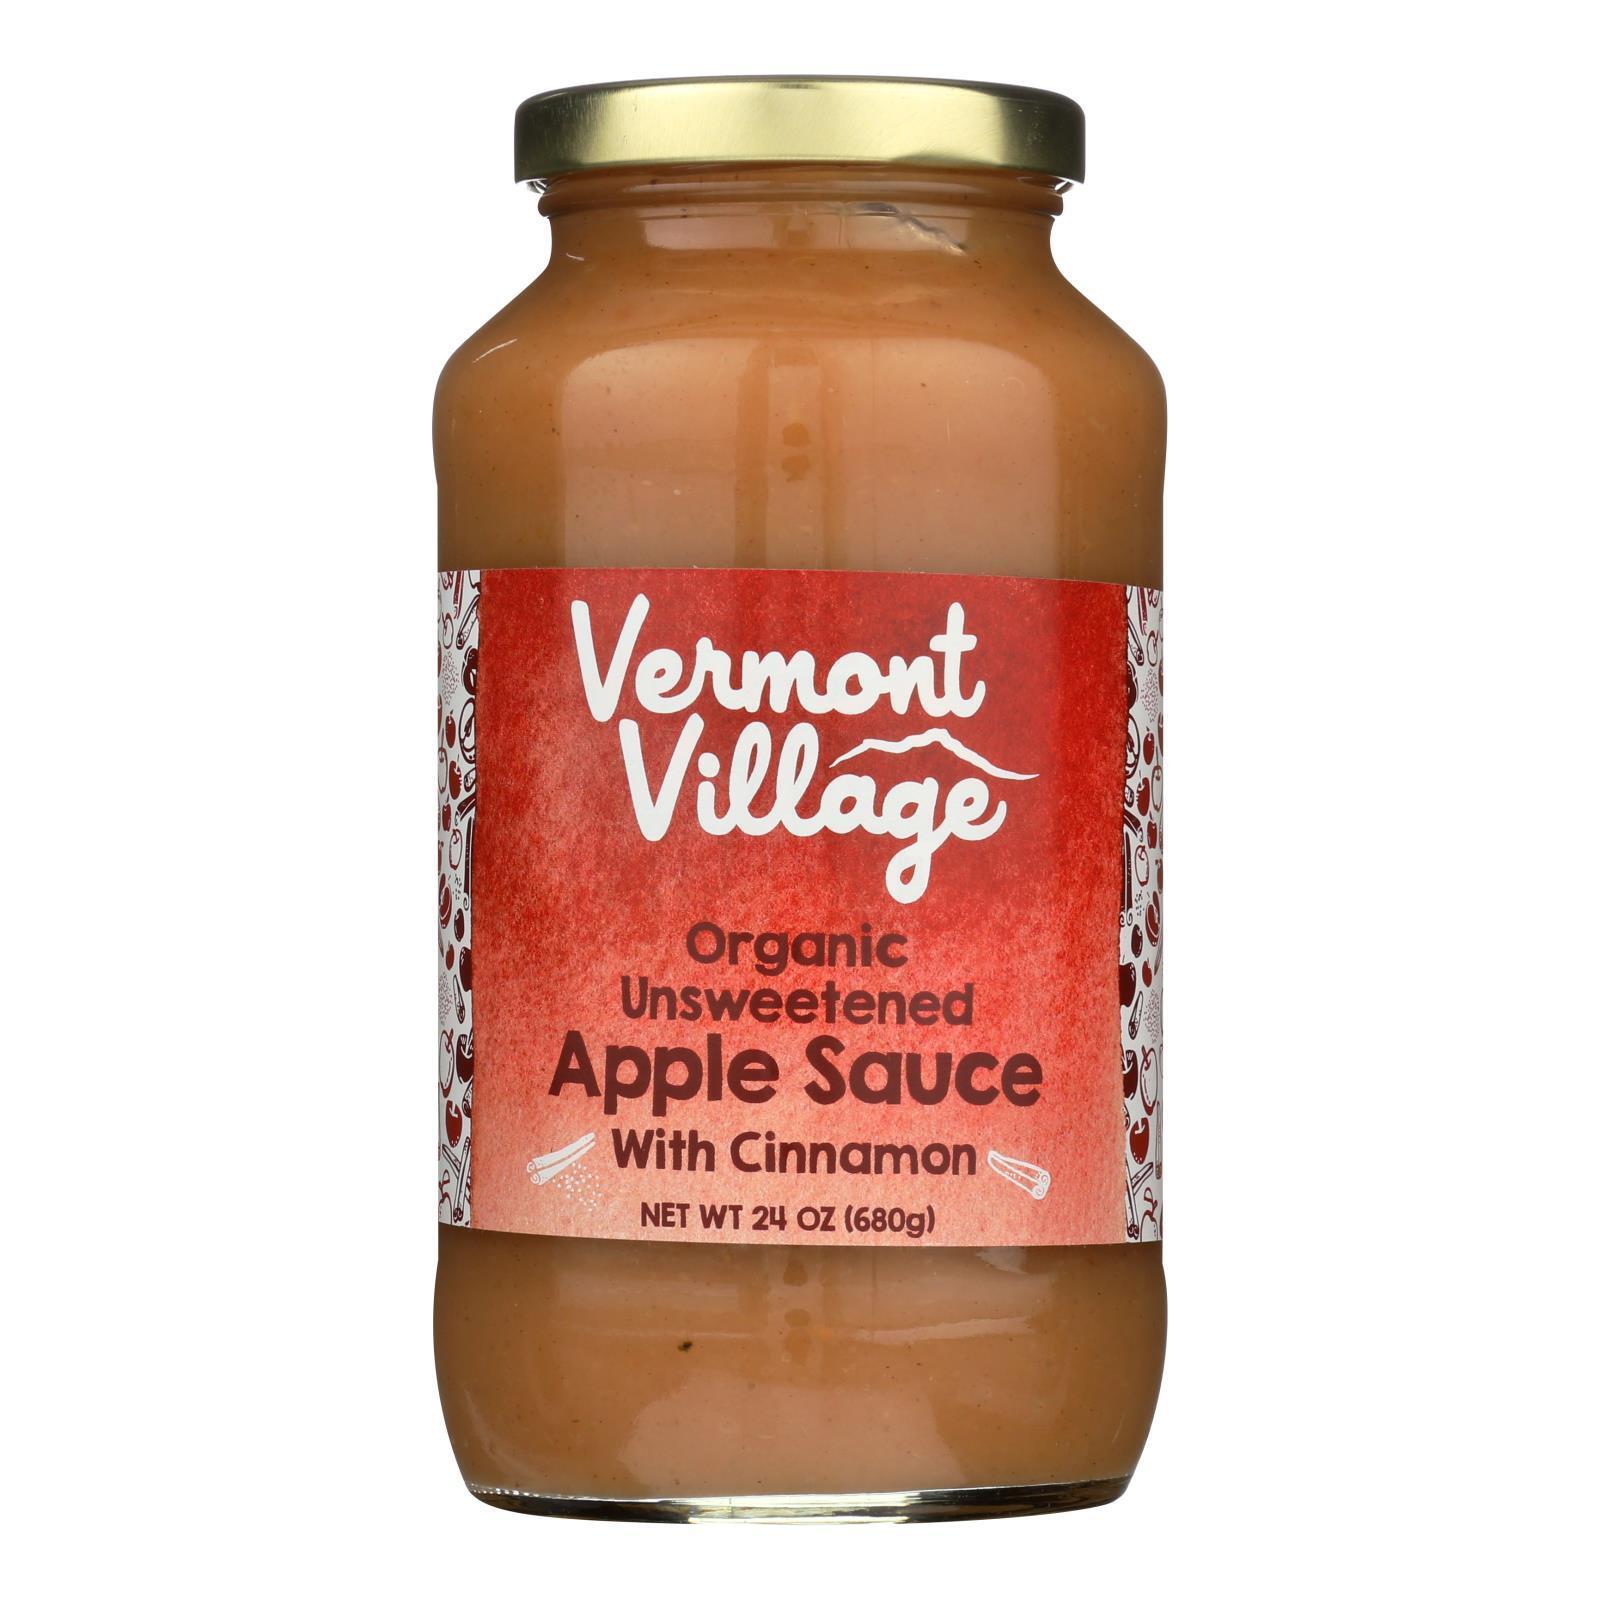 Vermont Village Organic Applesauce - Cinnamon - Case of 6 - 24 oz.